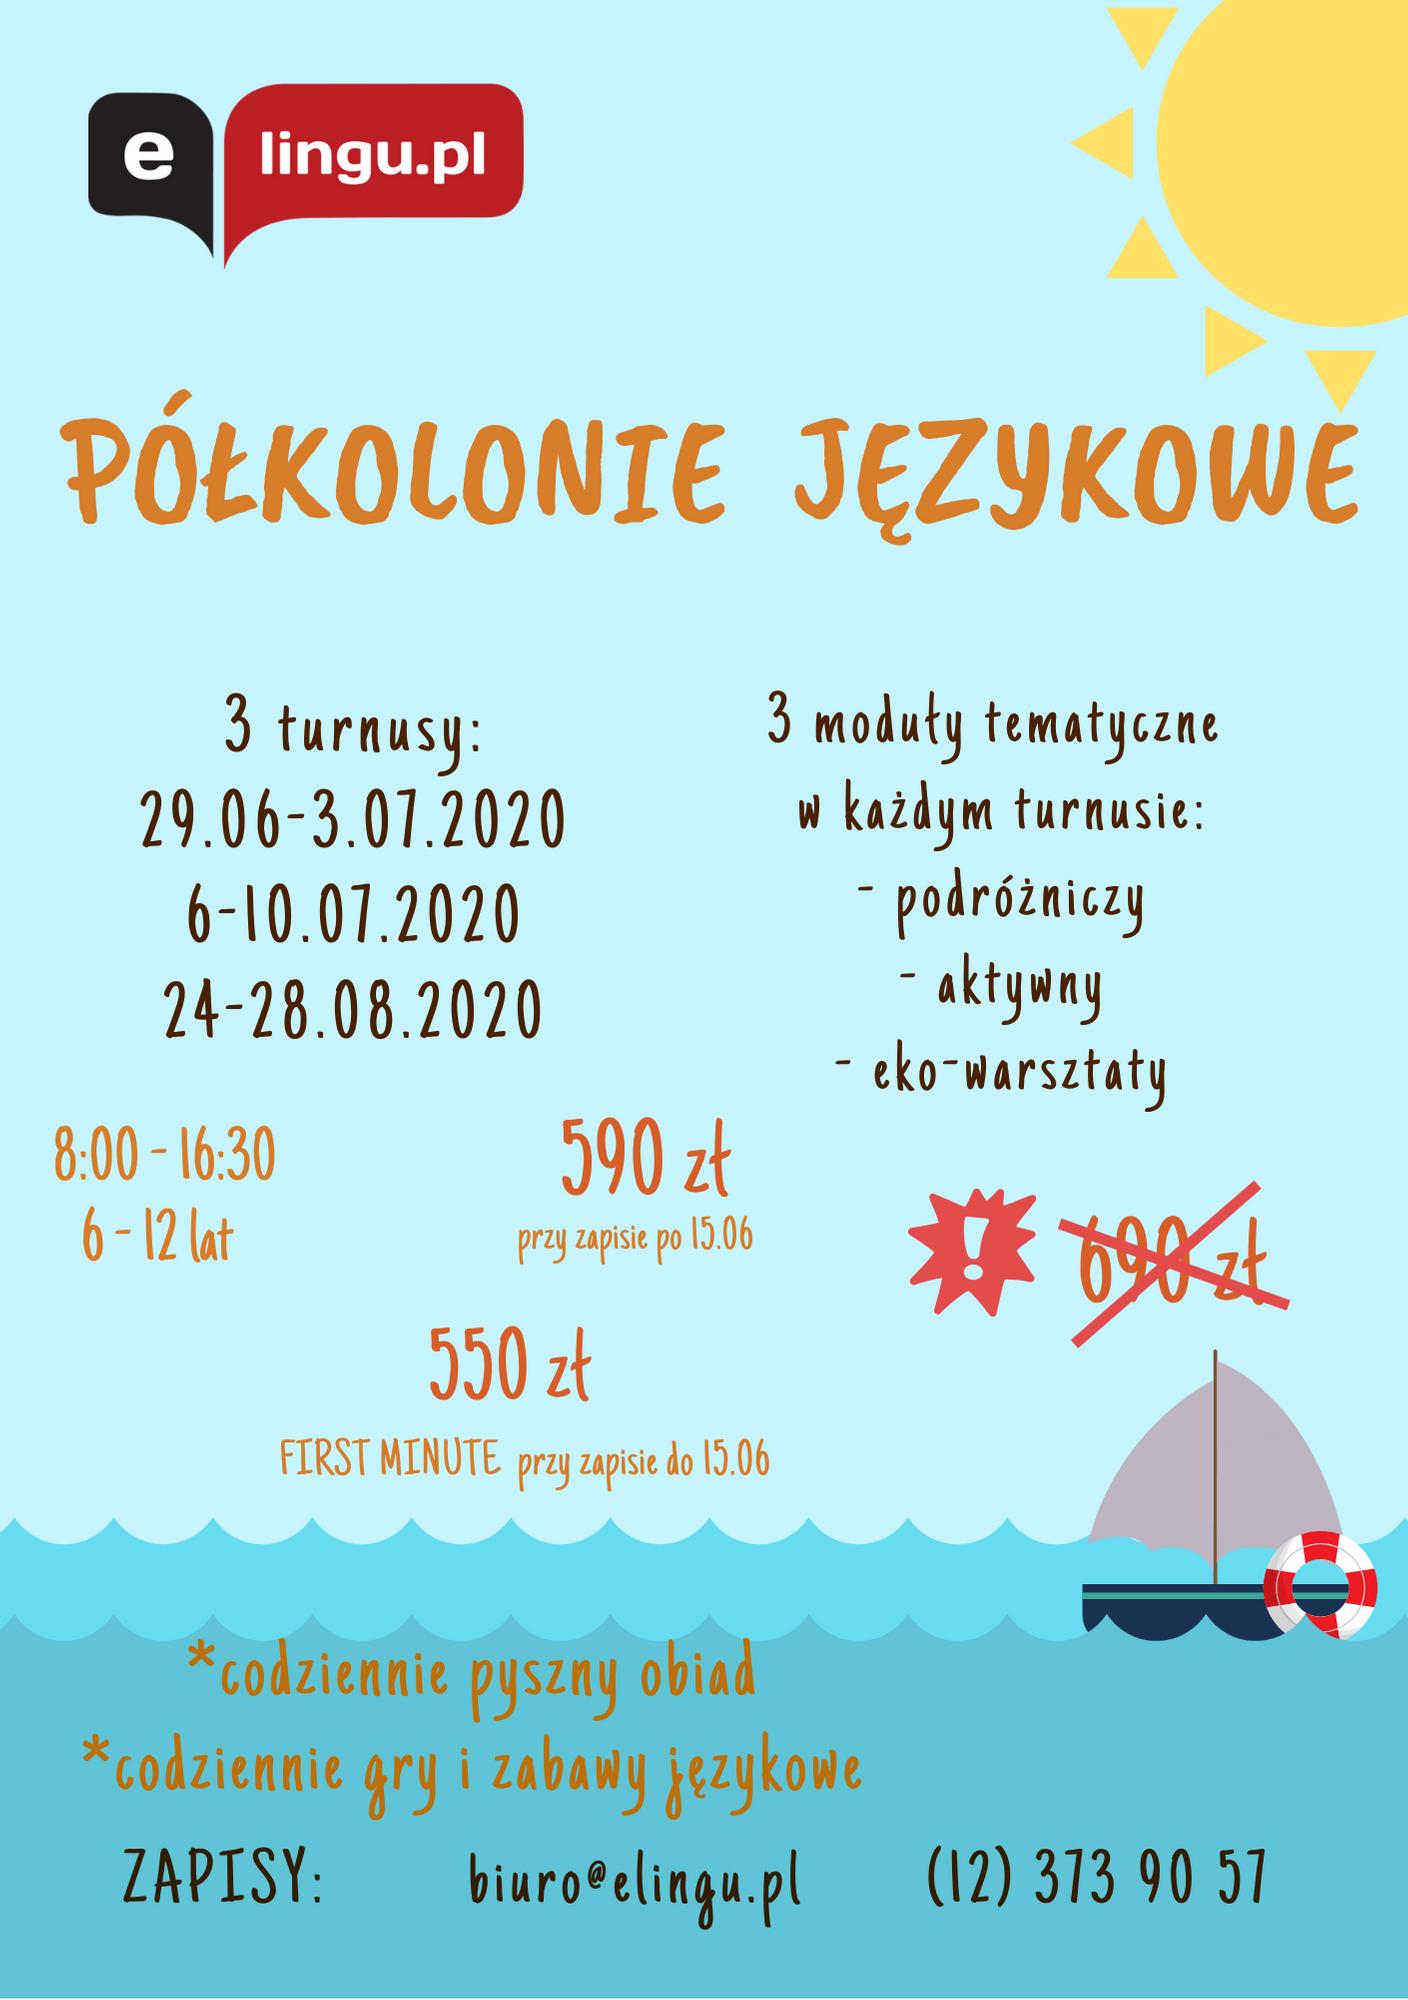 PÓŁKOLONIE ELINGU.PL 2020